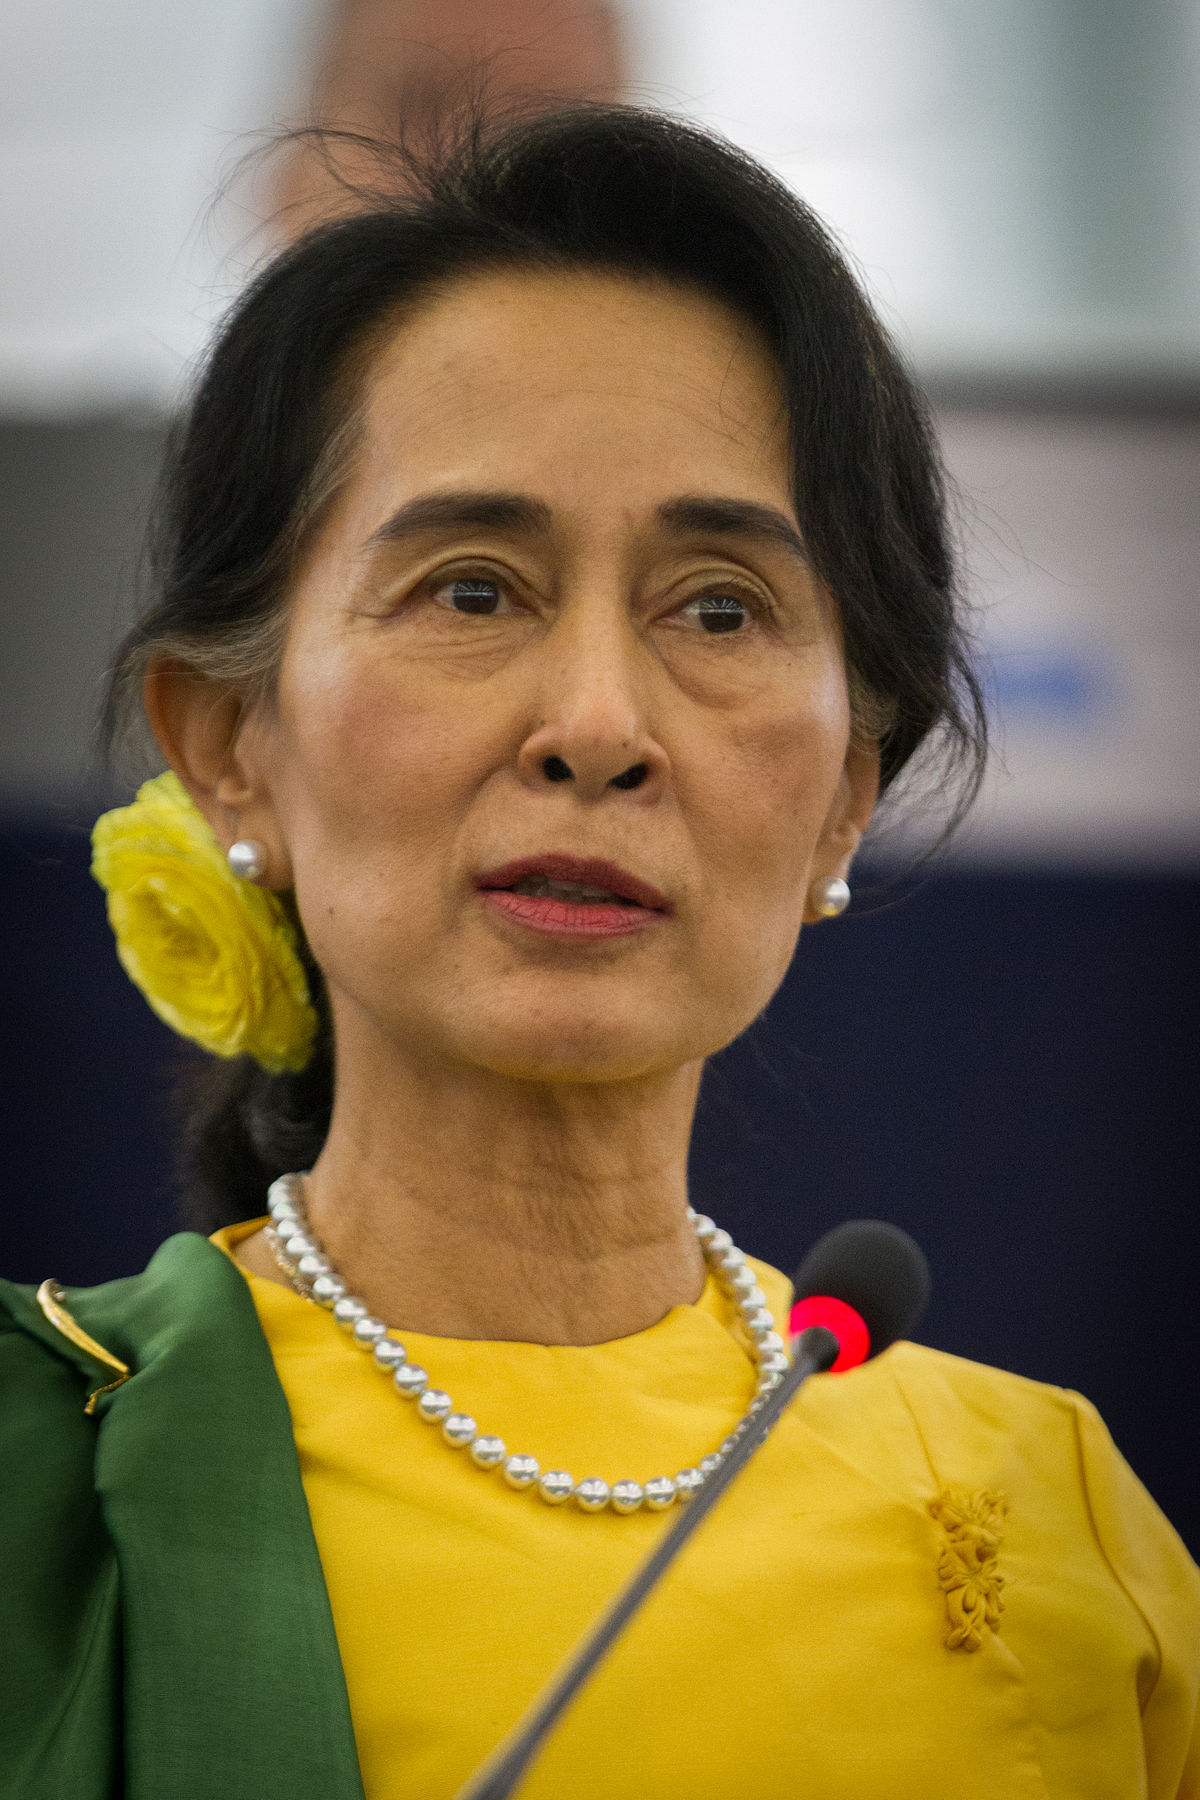 Au pays d'Aung San Suu Kyi…